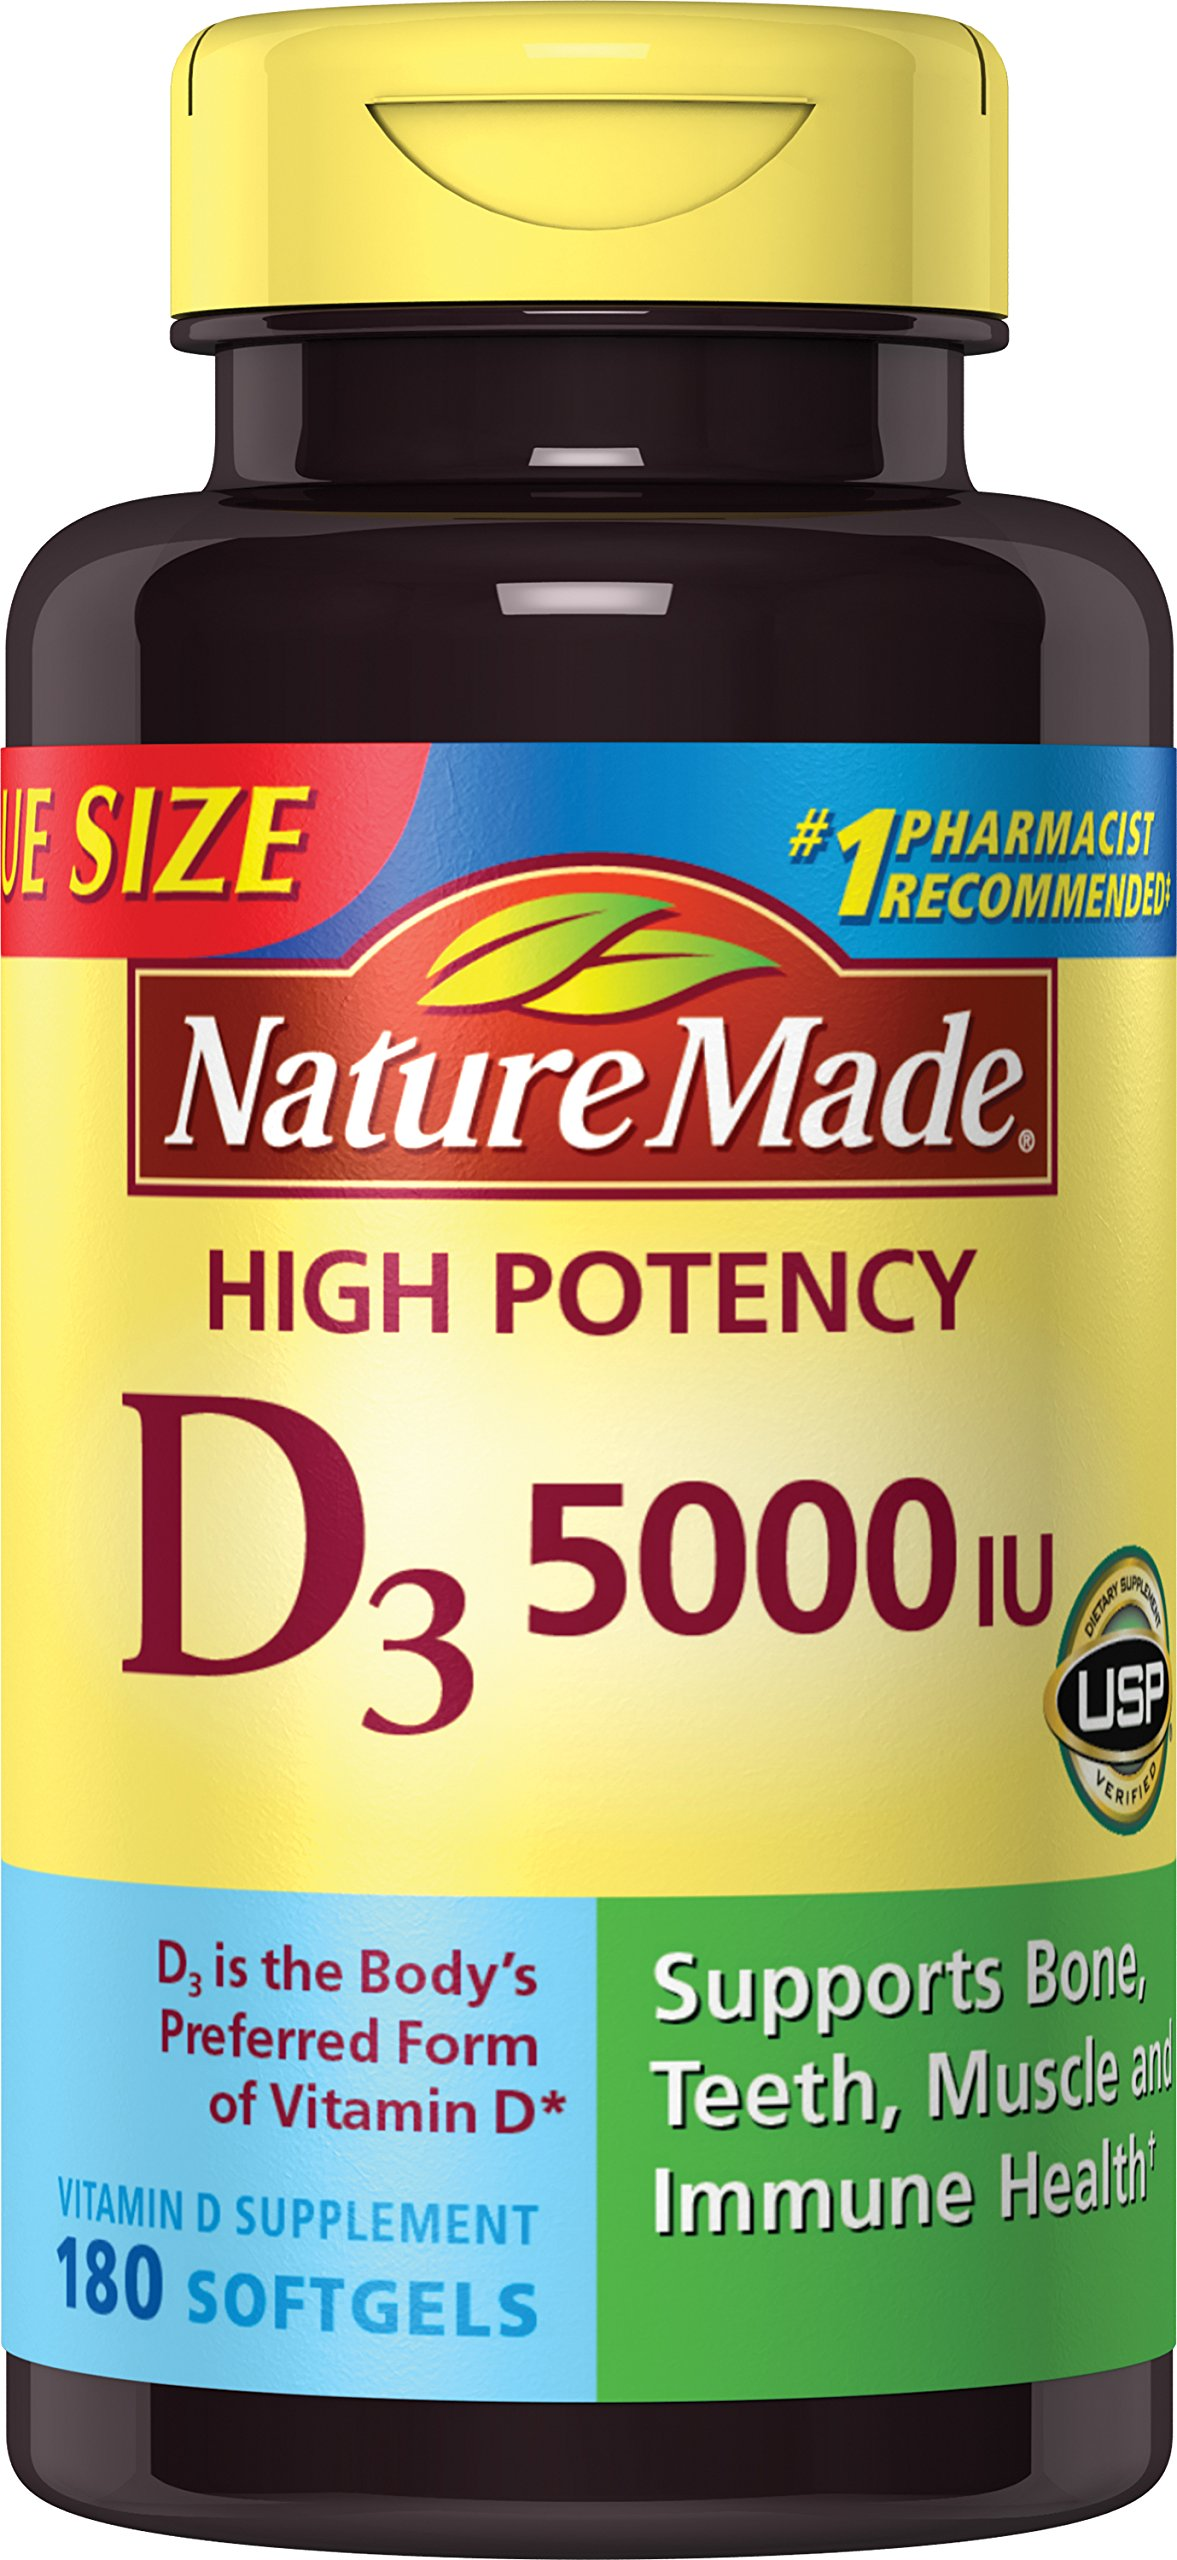 Amazon.com: Nature Made 1200mg of Fish Oil, 2400 per serving, 360mg of Omega-3, 300 Softgels ...